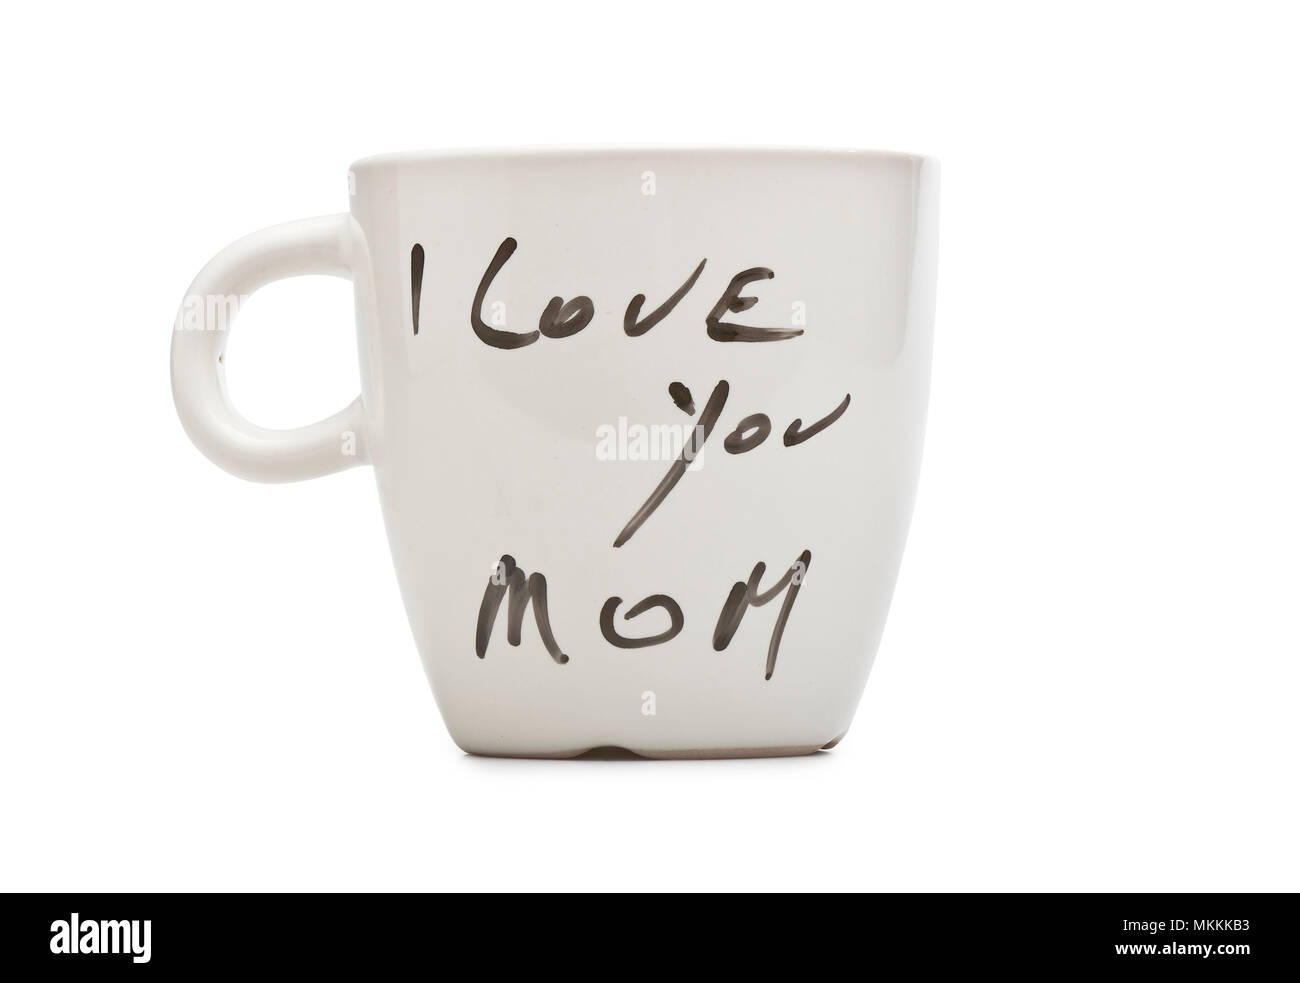 Je Taime Maman Texte Sur Mug Blanc Isolé Avec Clipping Path